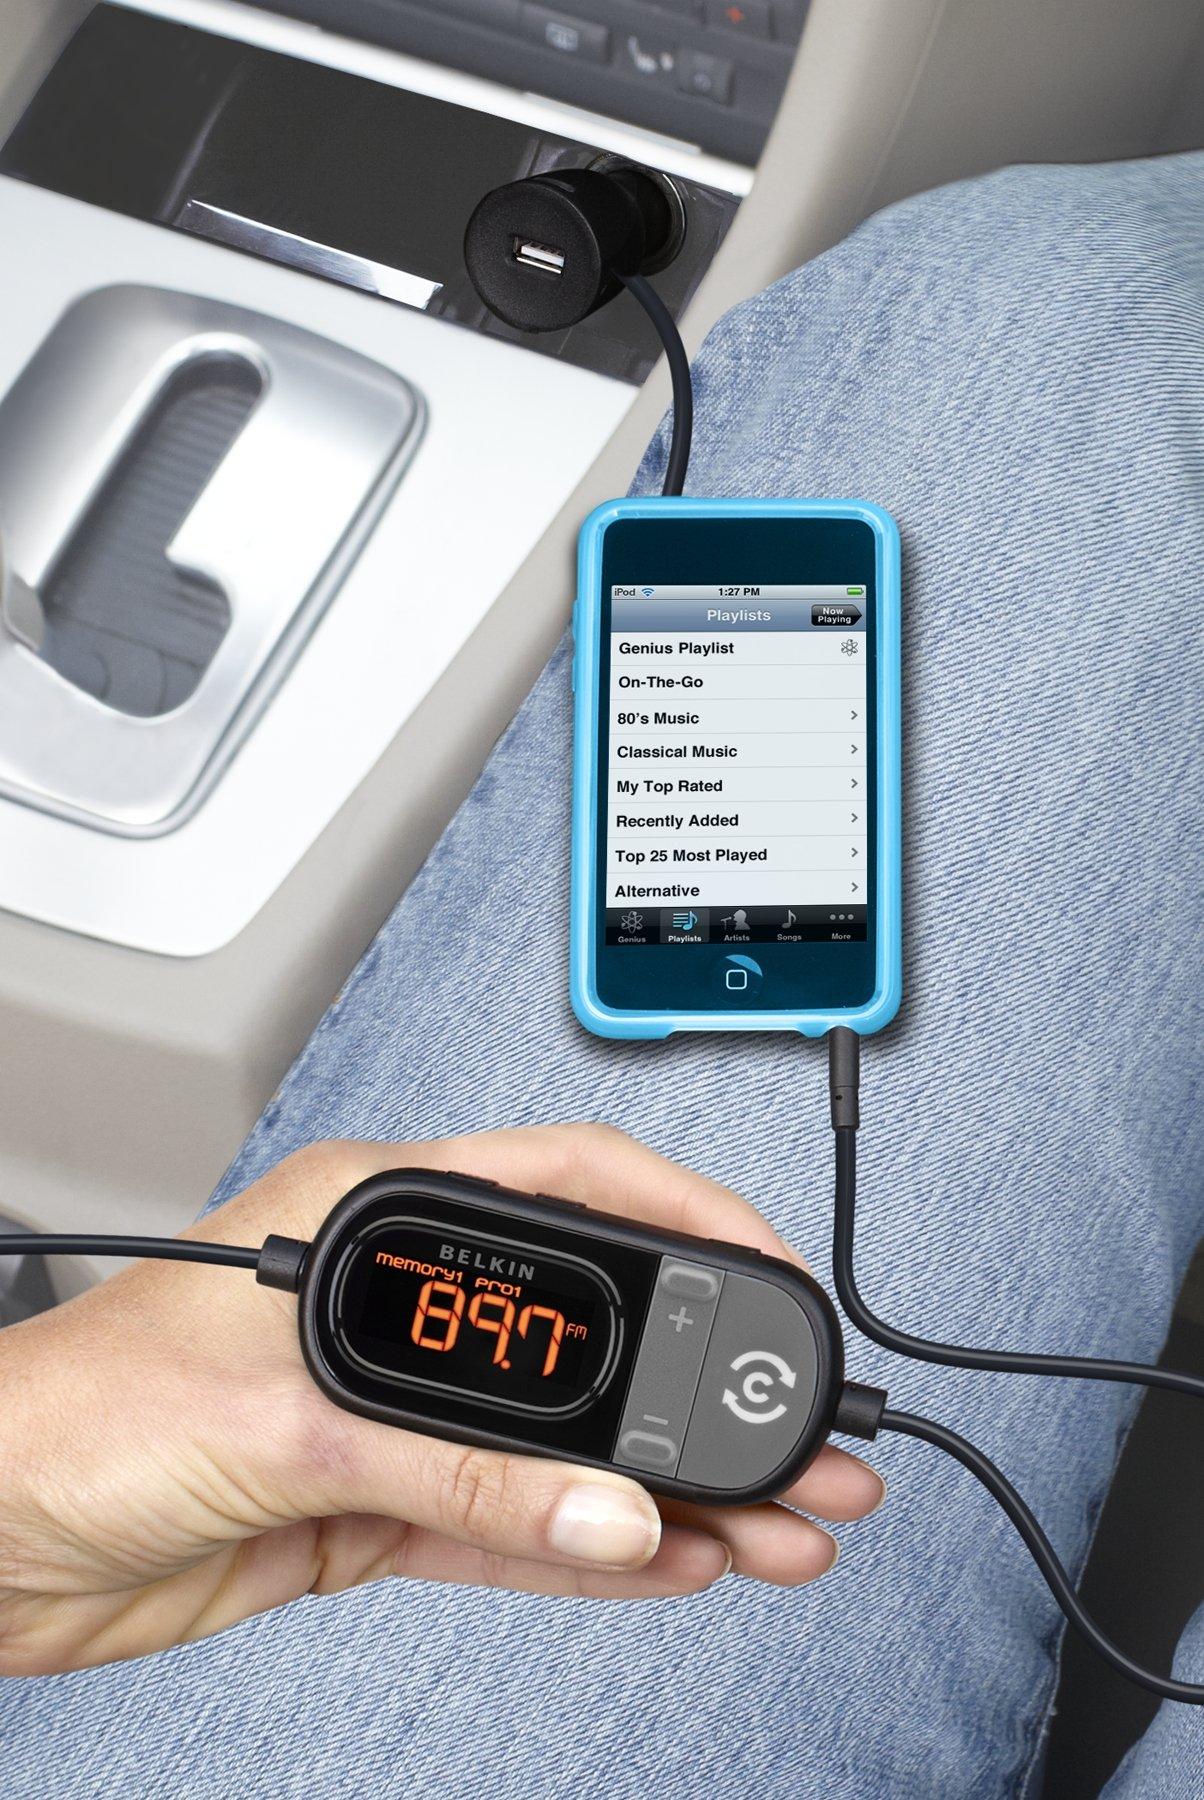 Belkin In Car Tunecast 6 Universal FM Transmitter